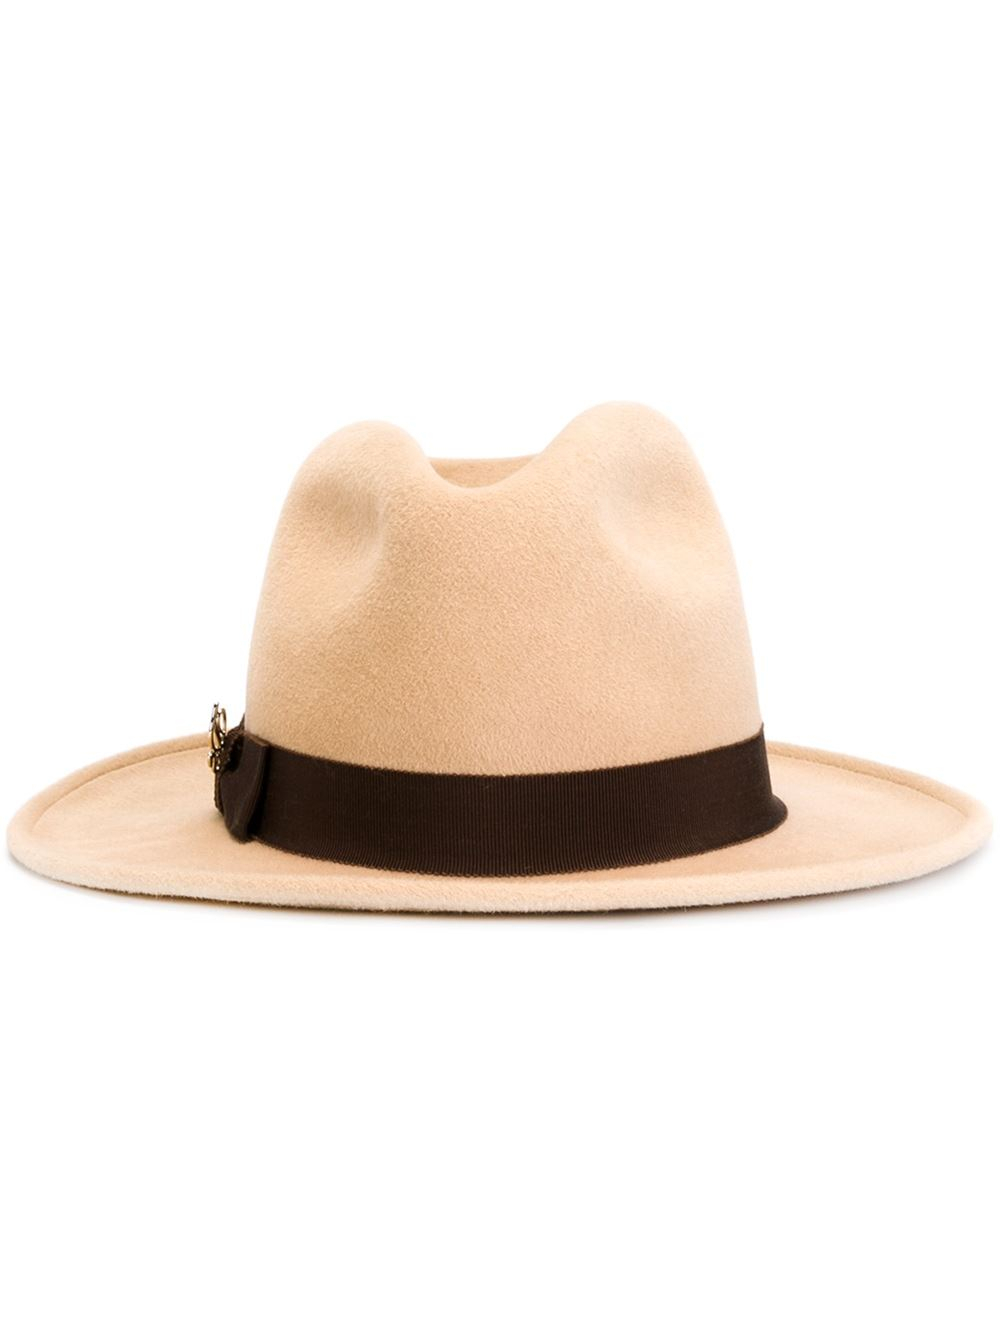 fedora hat - Nude & Neutrals Dsquared2 i8f8c